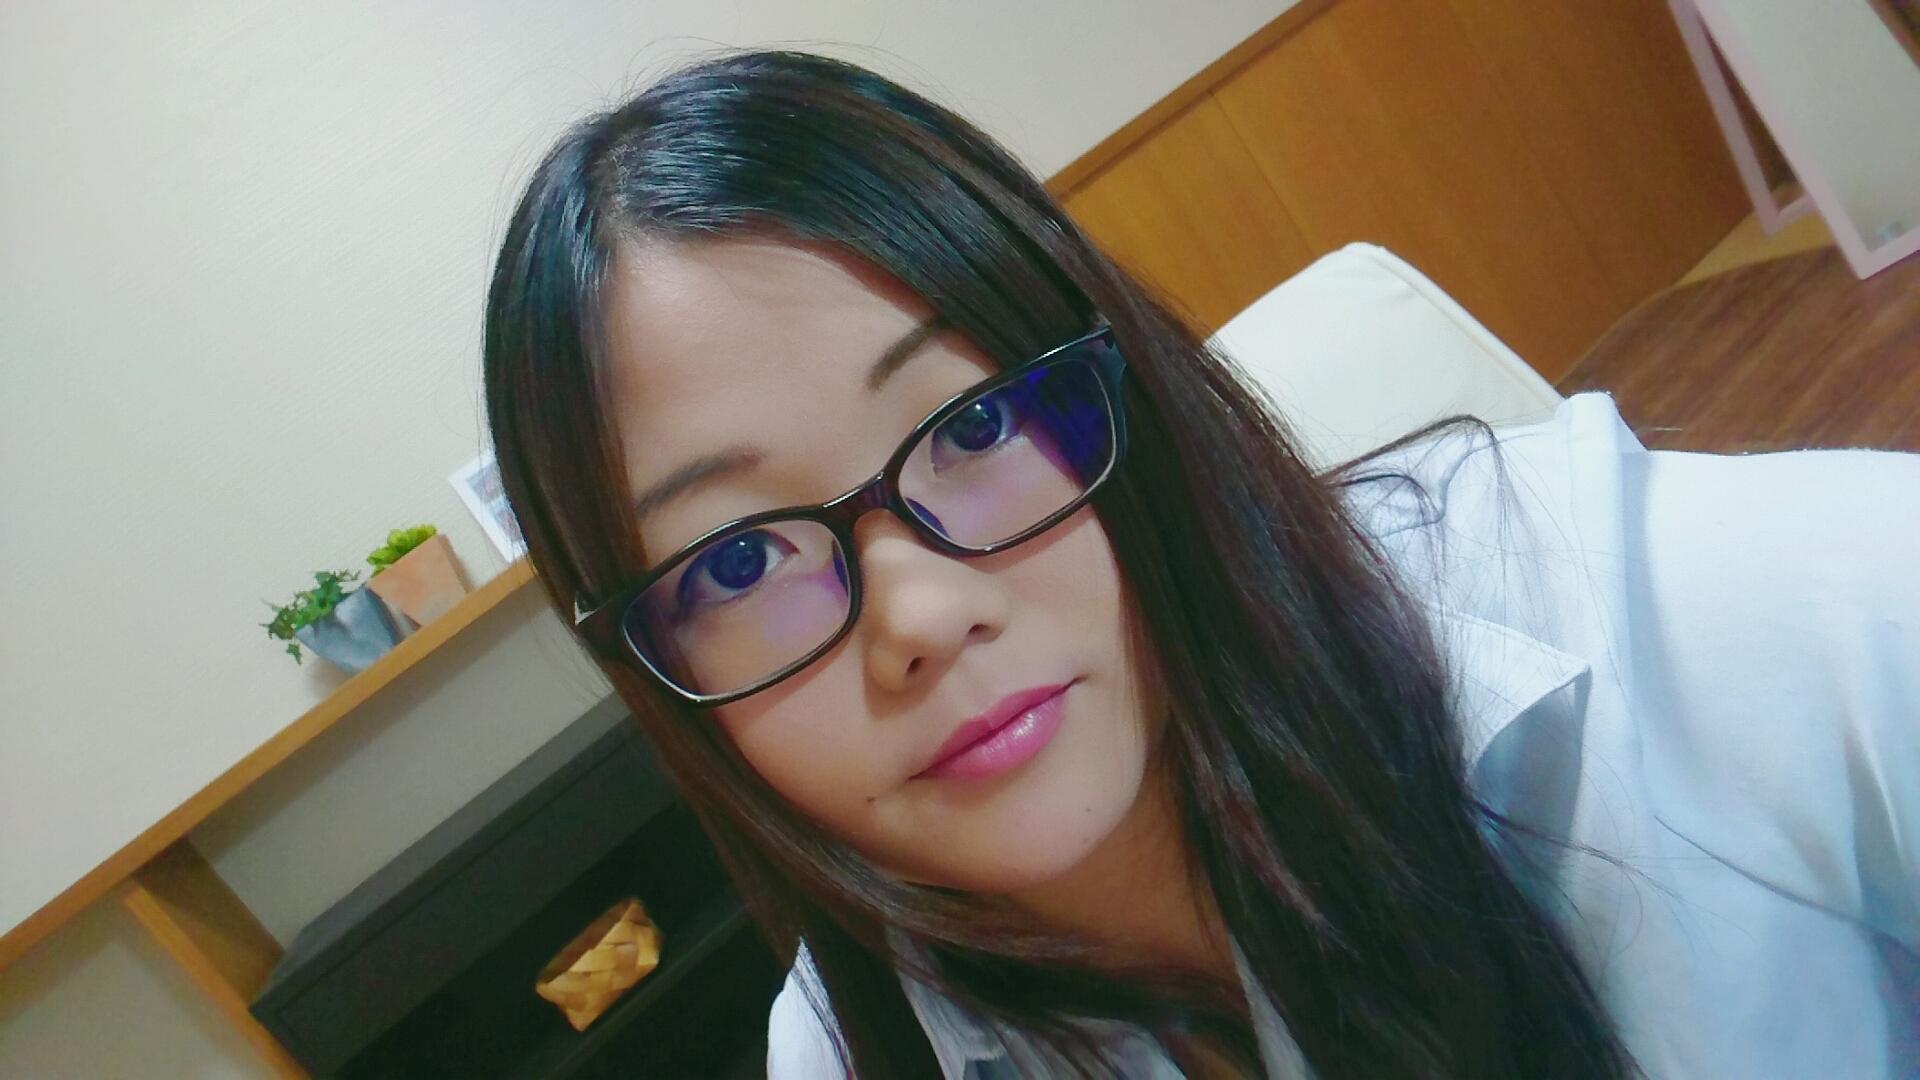 Nonco - Japanese webcam girl